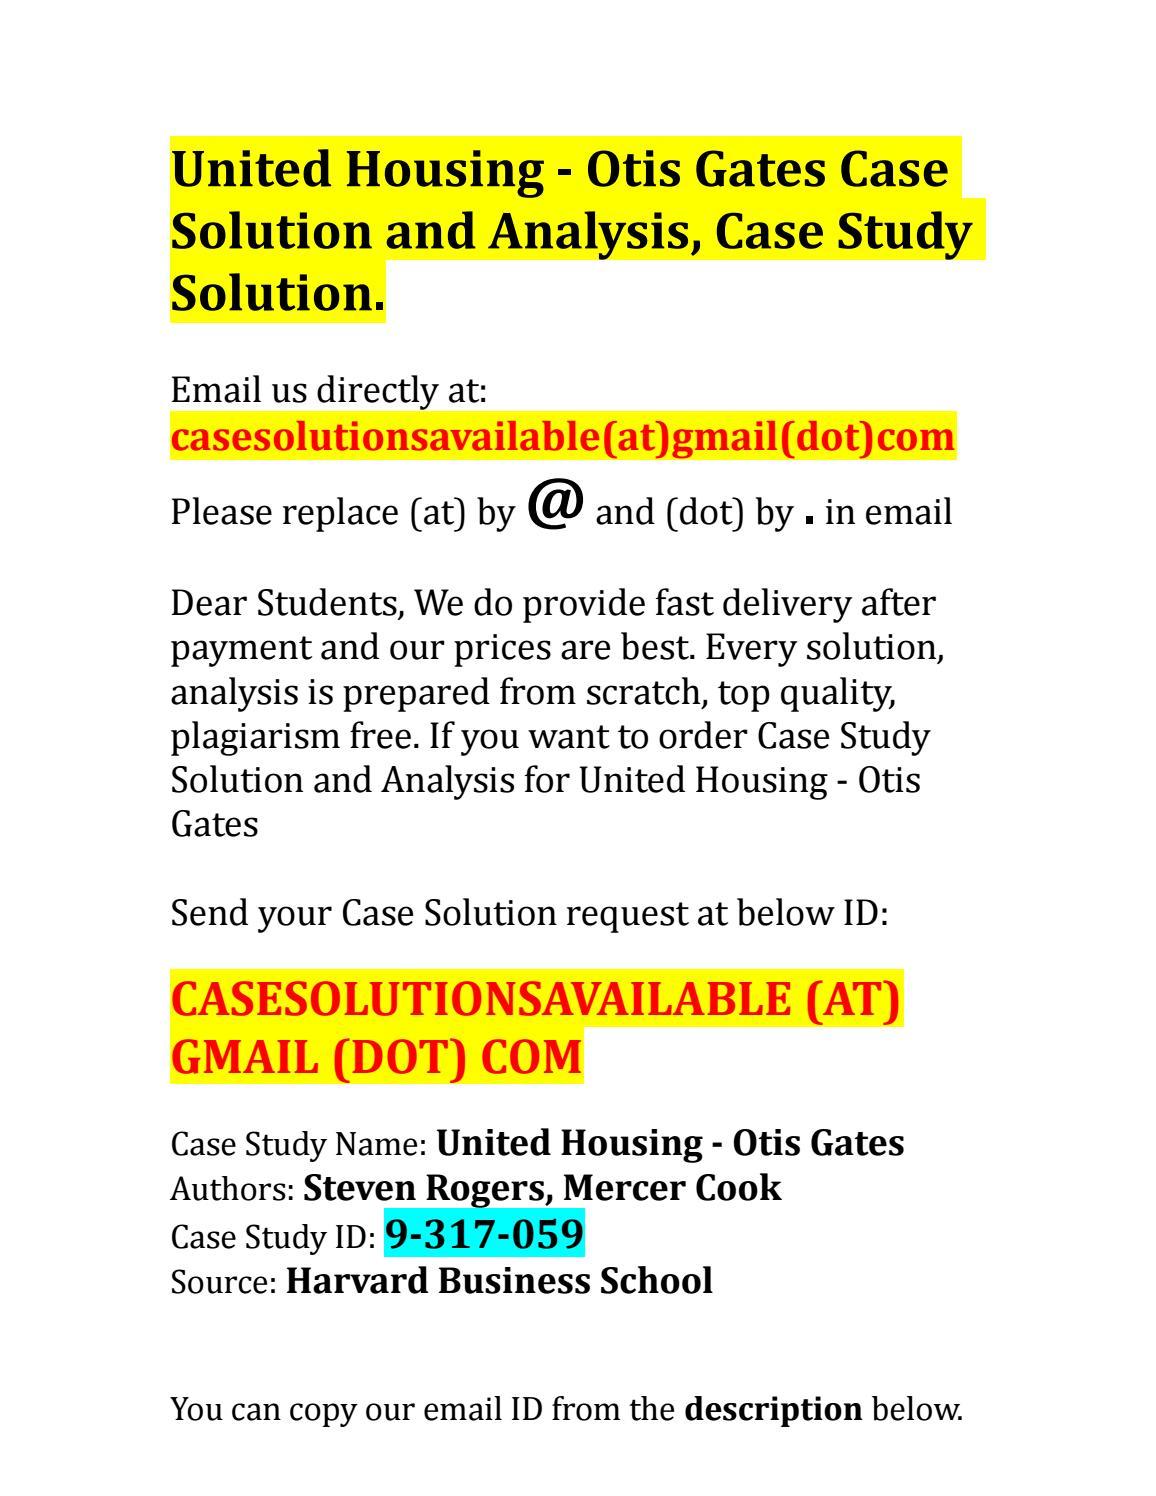 Ict info 4 coursework